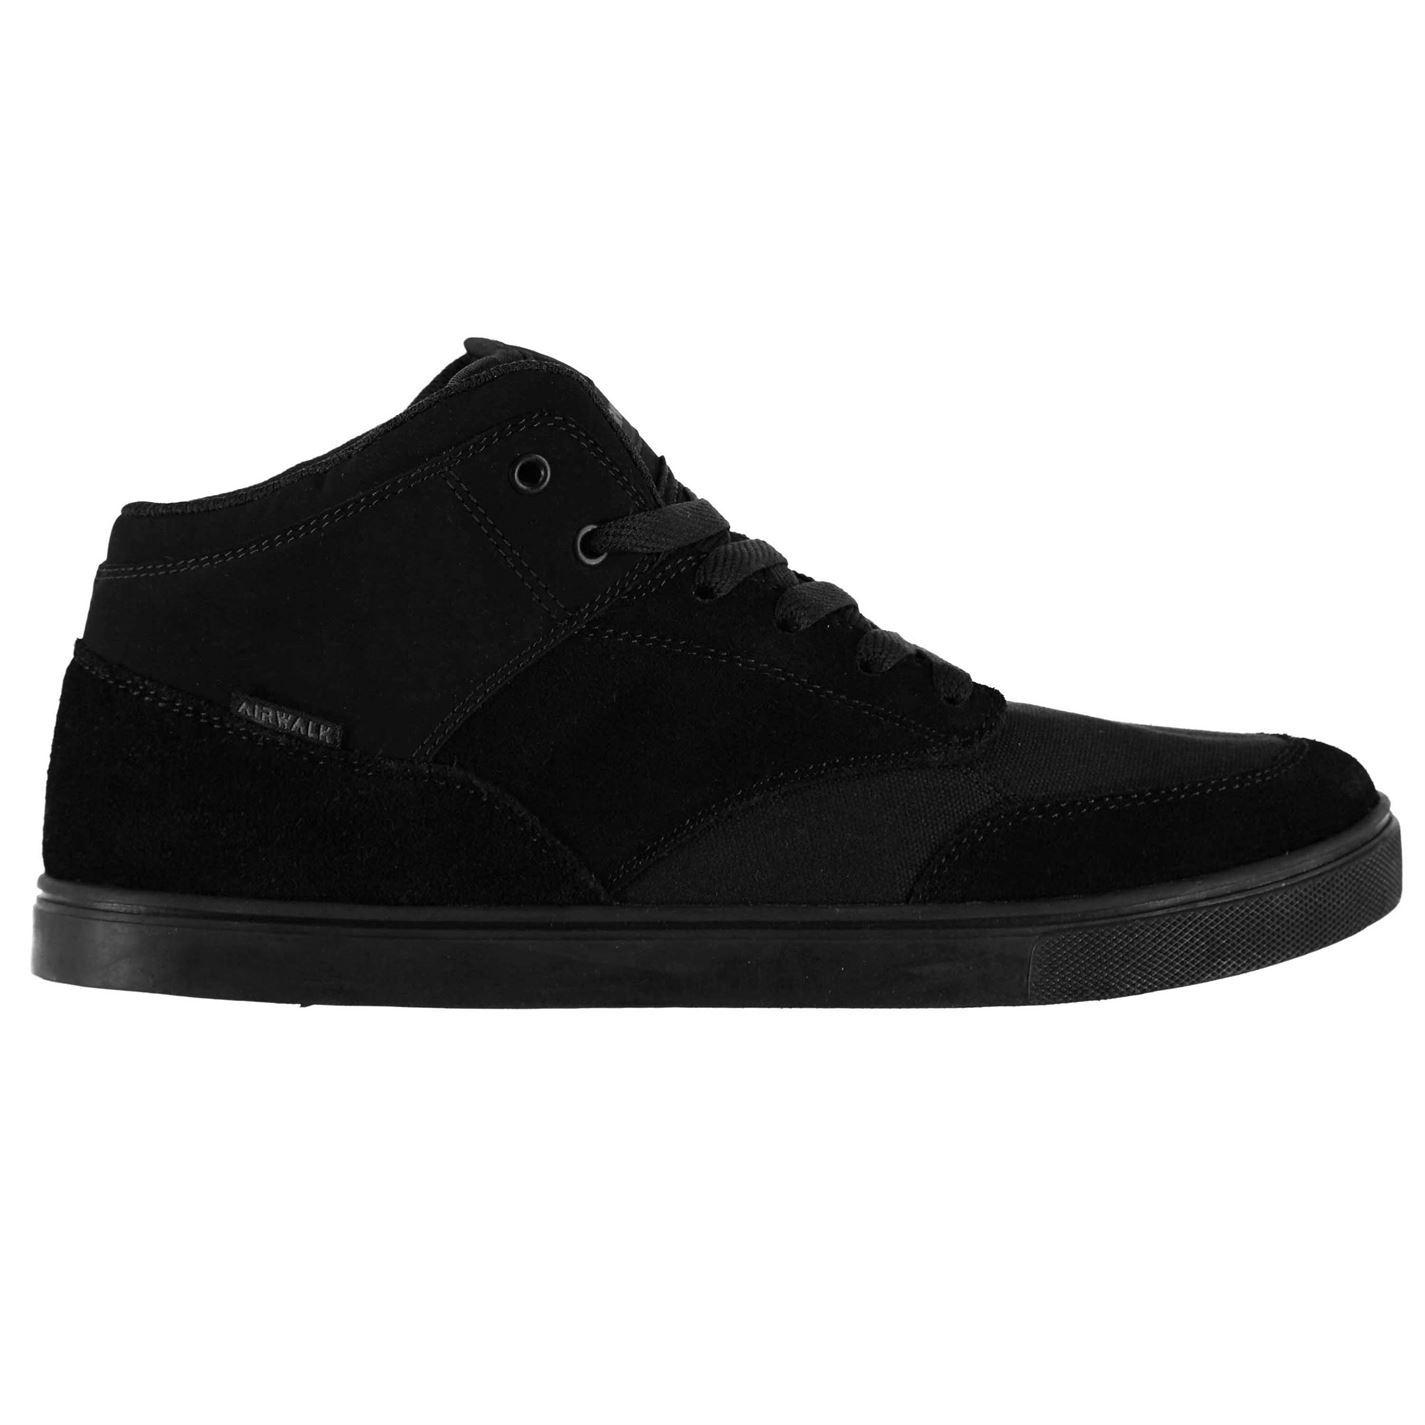 Airwalk Breaker Mid Skate Shoes Mens